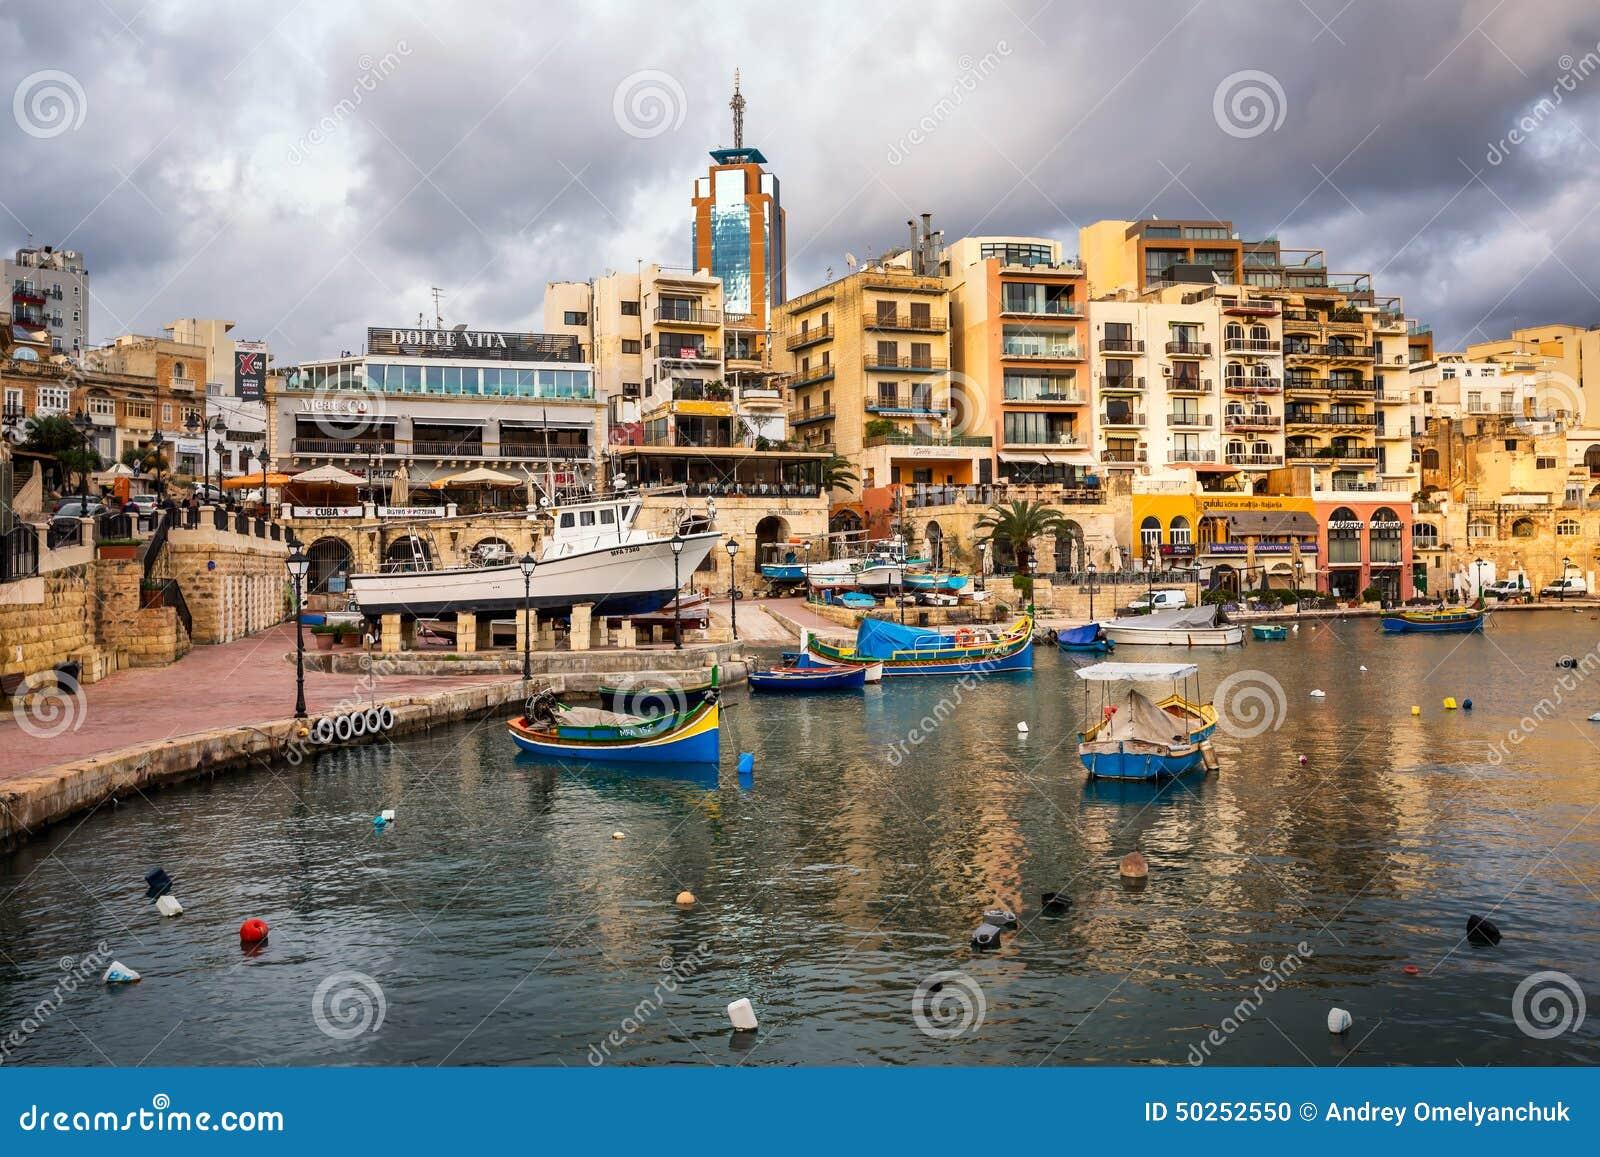 Spinola Bay And Portomaso Tower In Saint Julian, Malta Editorial Image - Image: 50252550